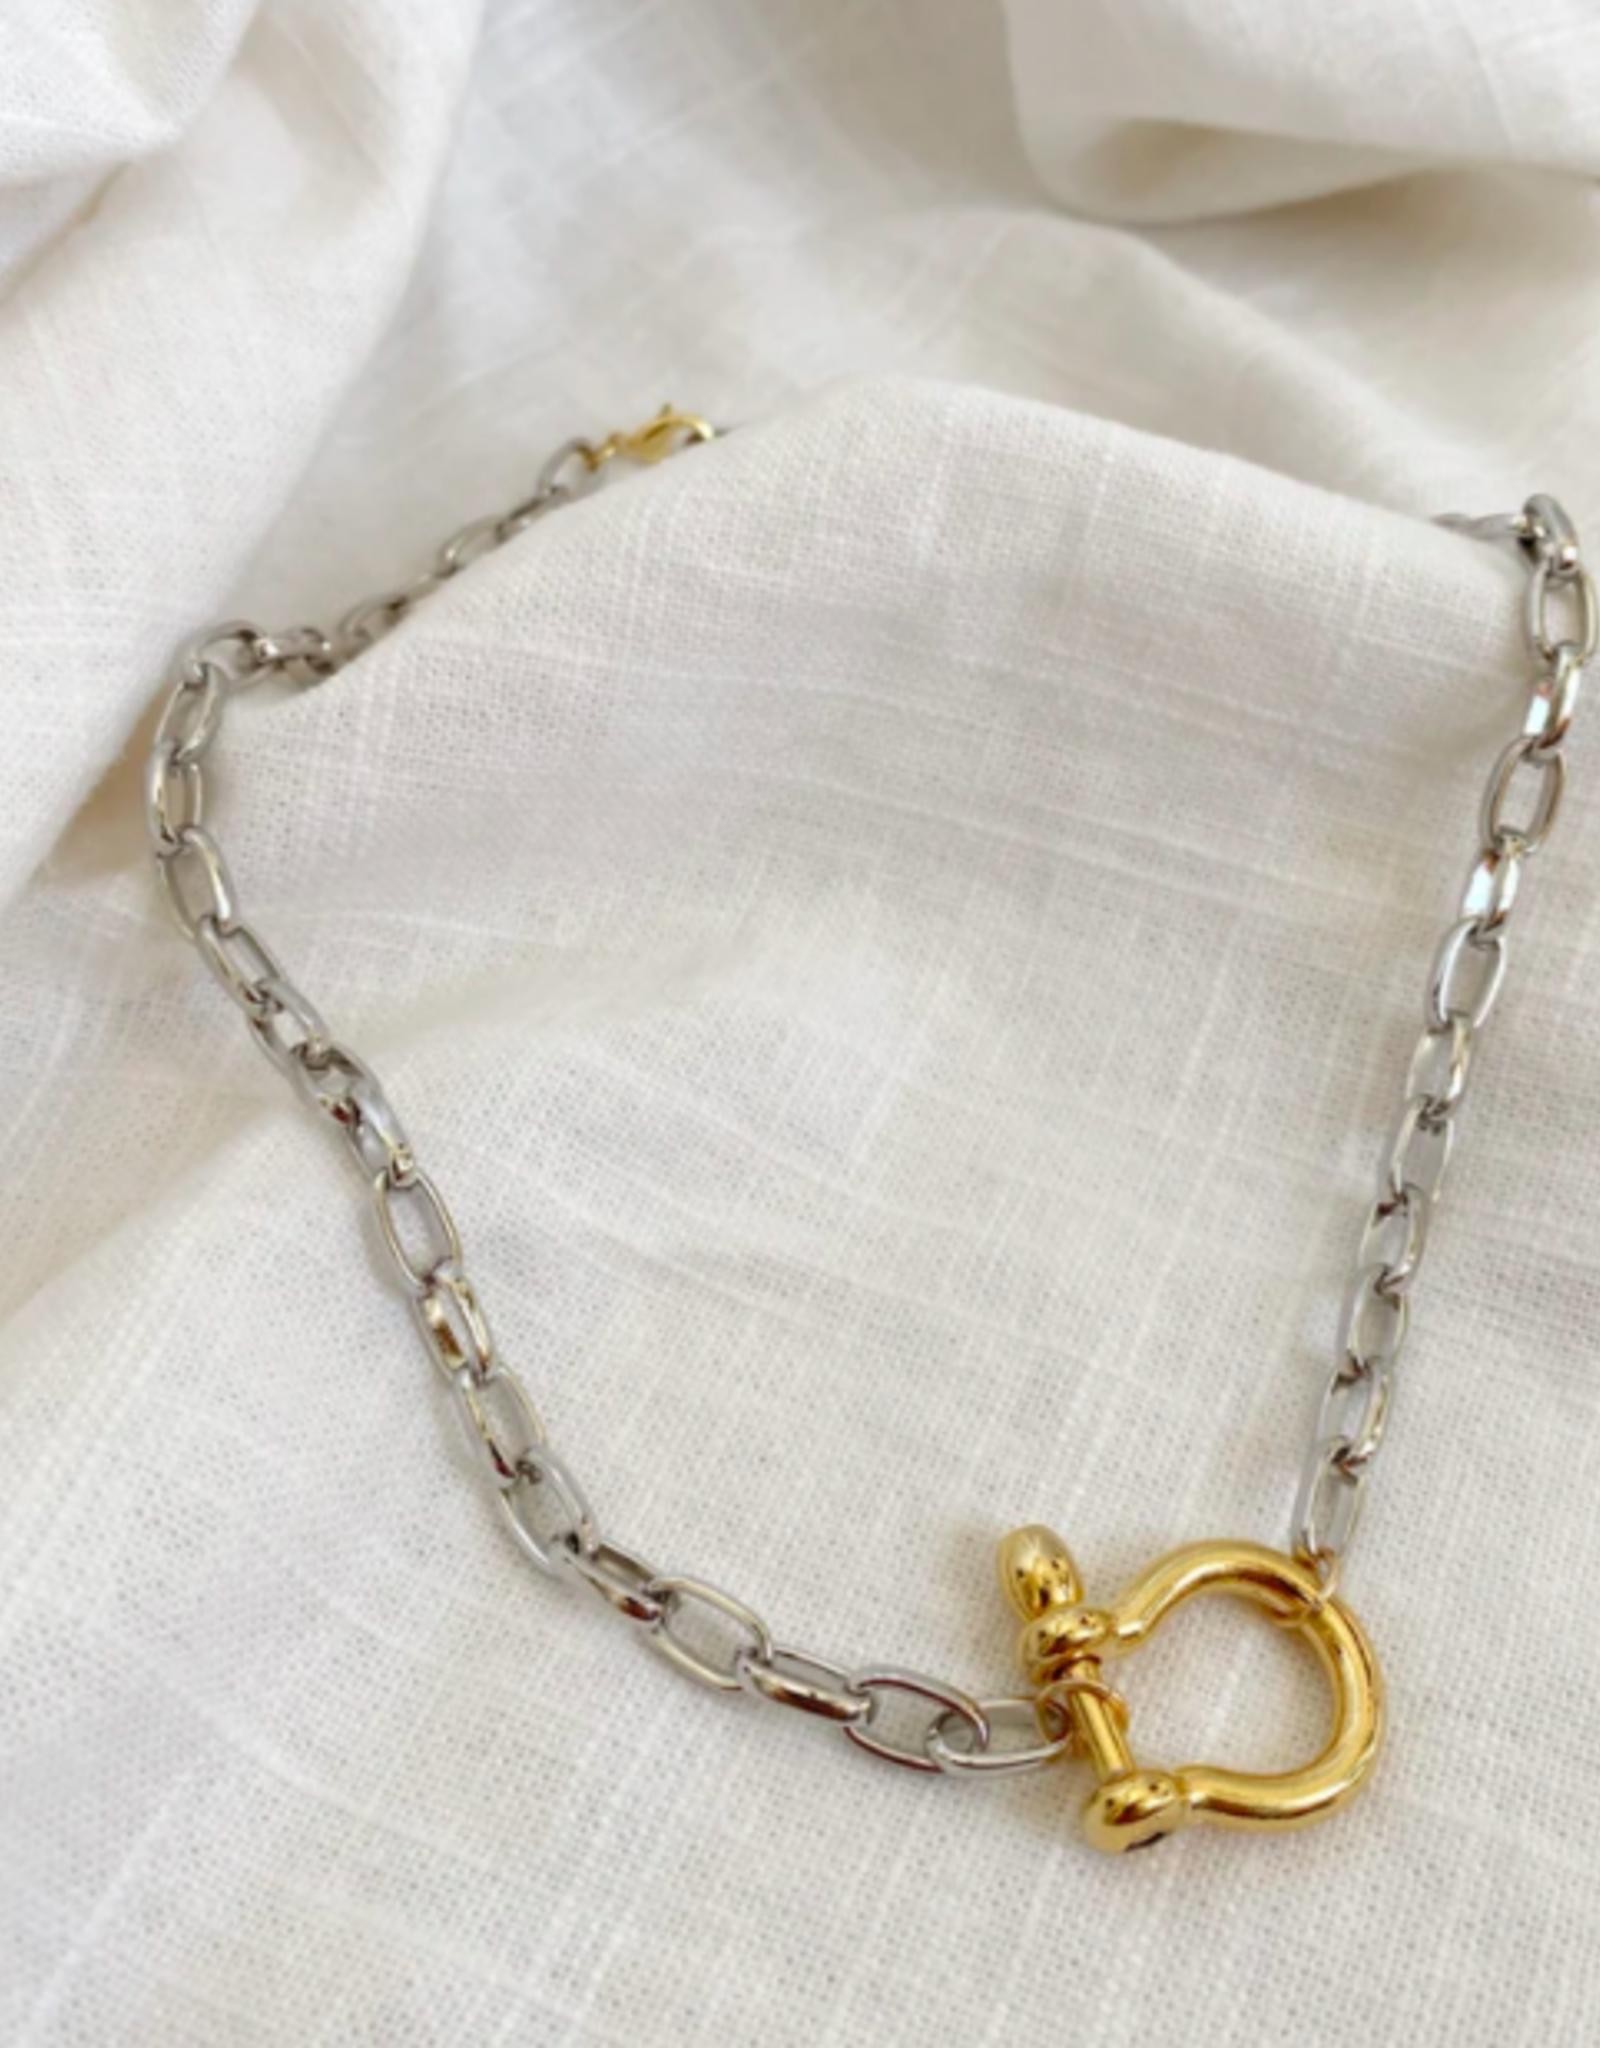 Bofemme Bofemme Celine Mixed Metal Necklace